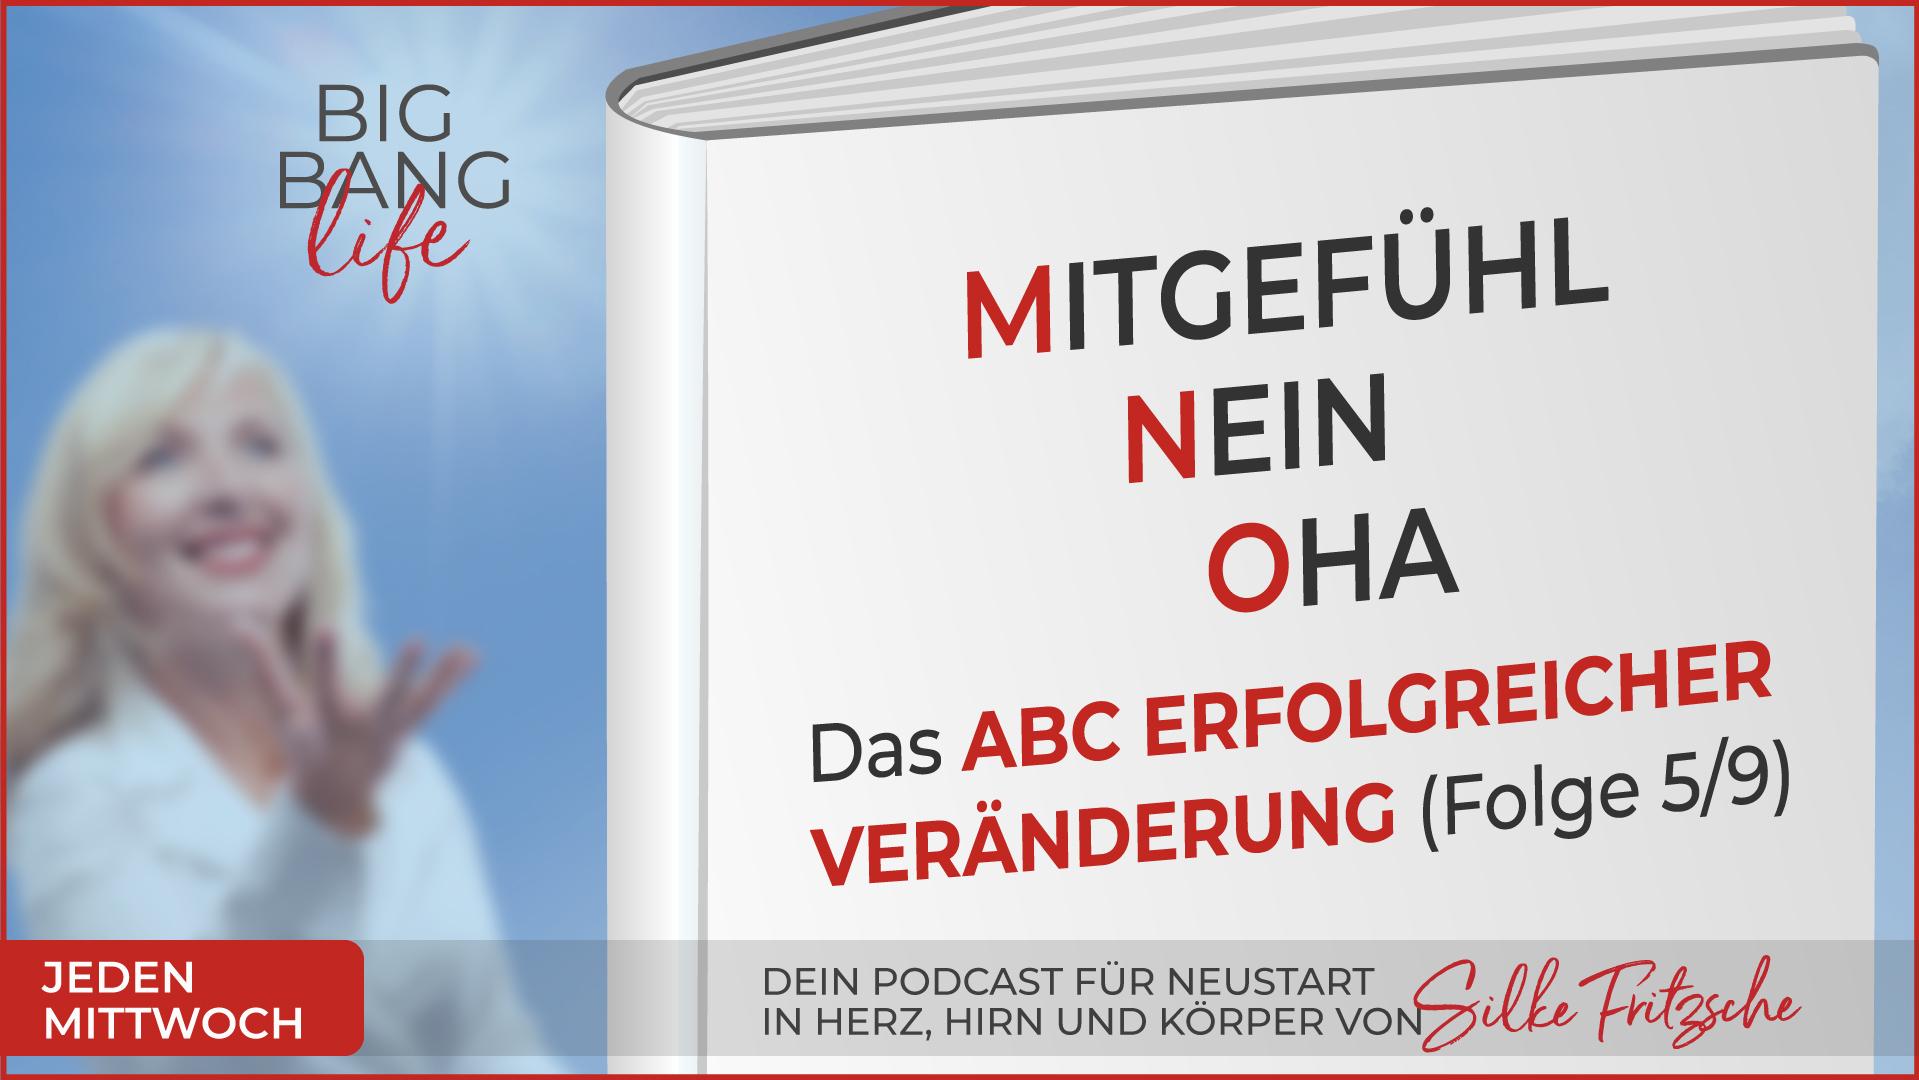 Der Big Bang life Podcast mit Silke Fritzsche - Mitgefühl, Nein, Oha